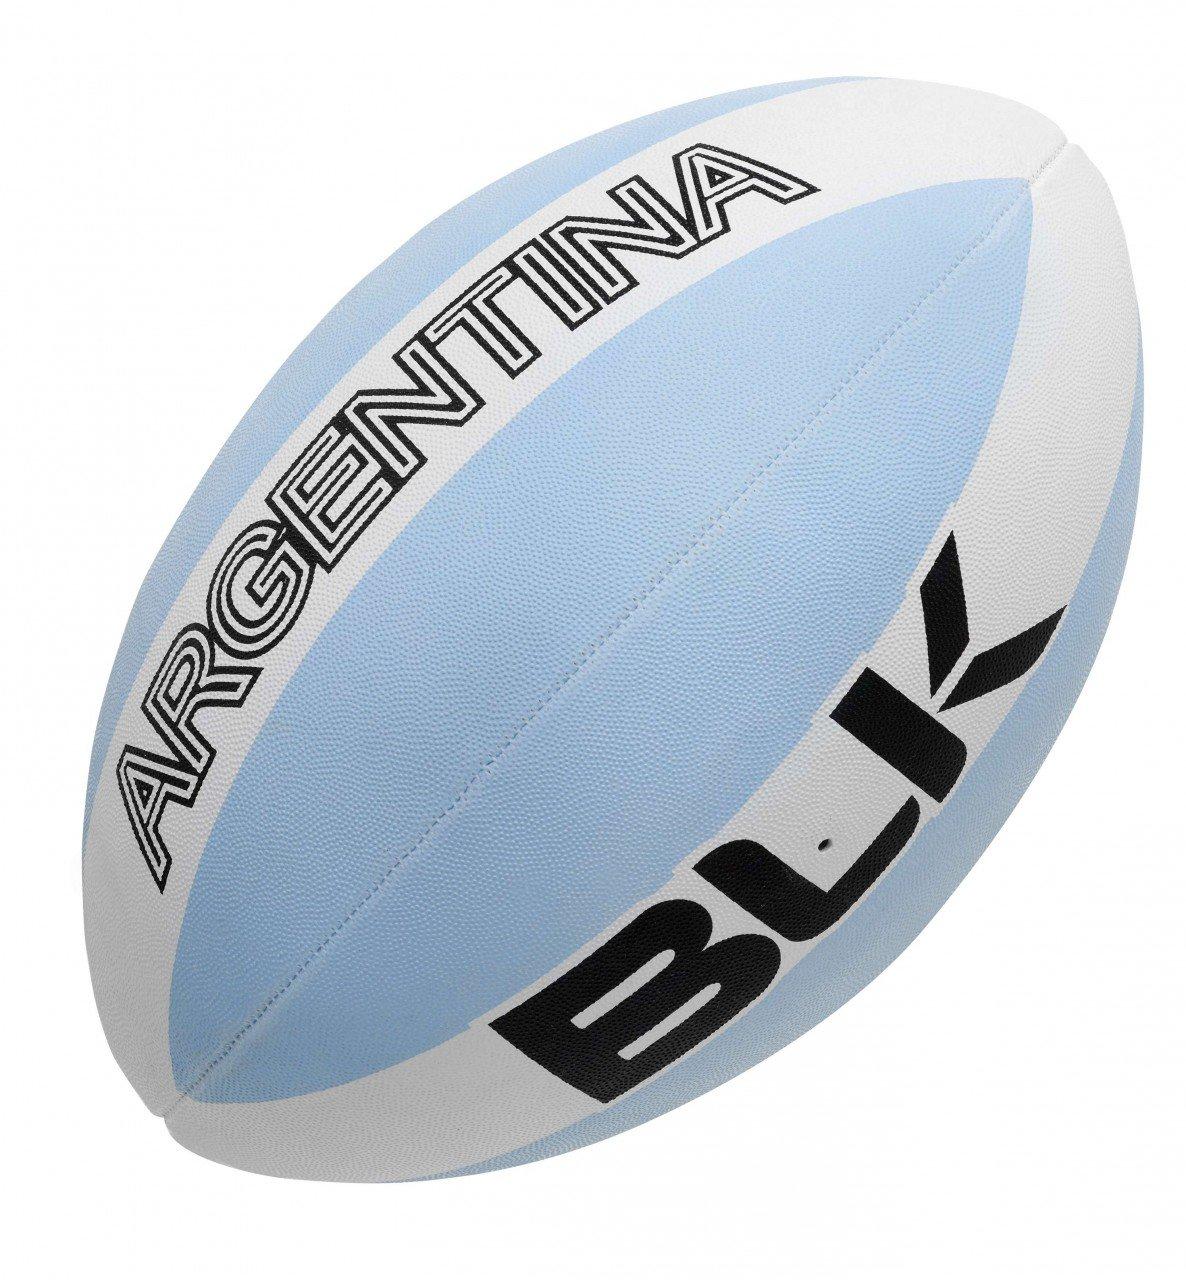 BLK Nation Ball Argentina Pelotas, Azul Celeste/Blanco, 5 UHLAA|#uhlsport 420120401